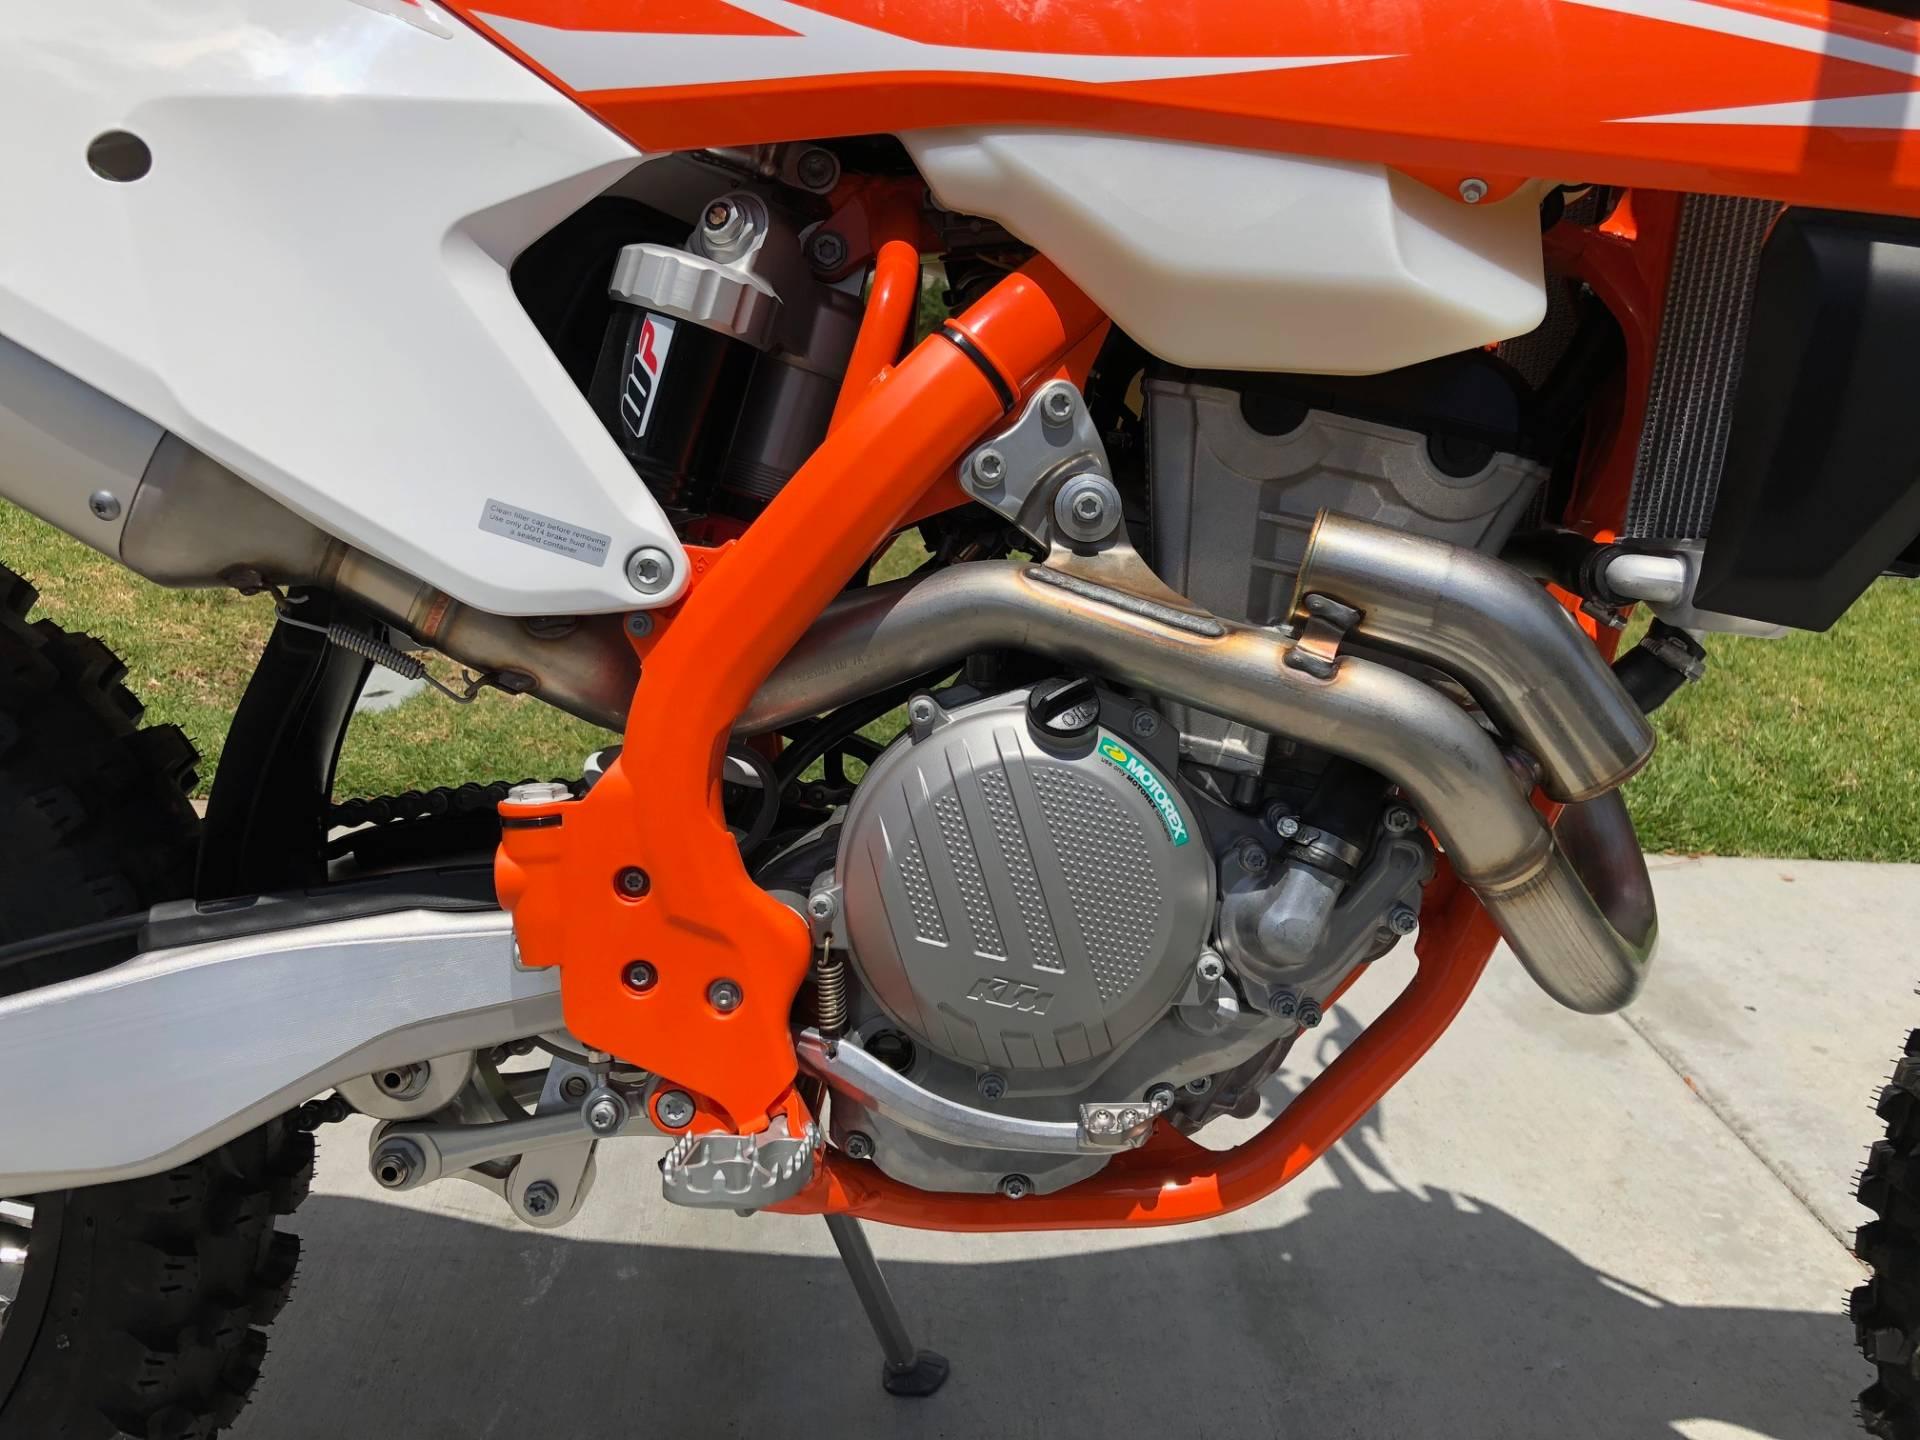 2018 KTM 350 XC-F 10